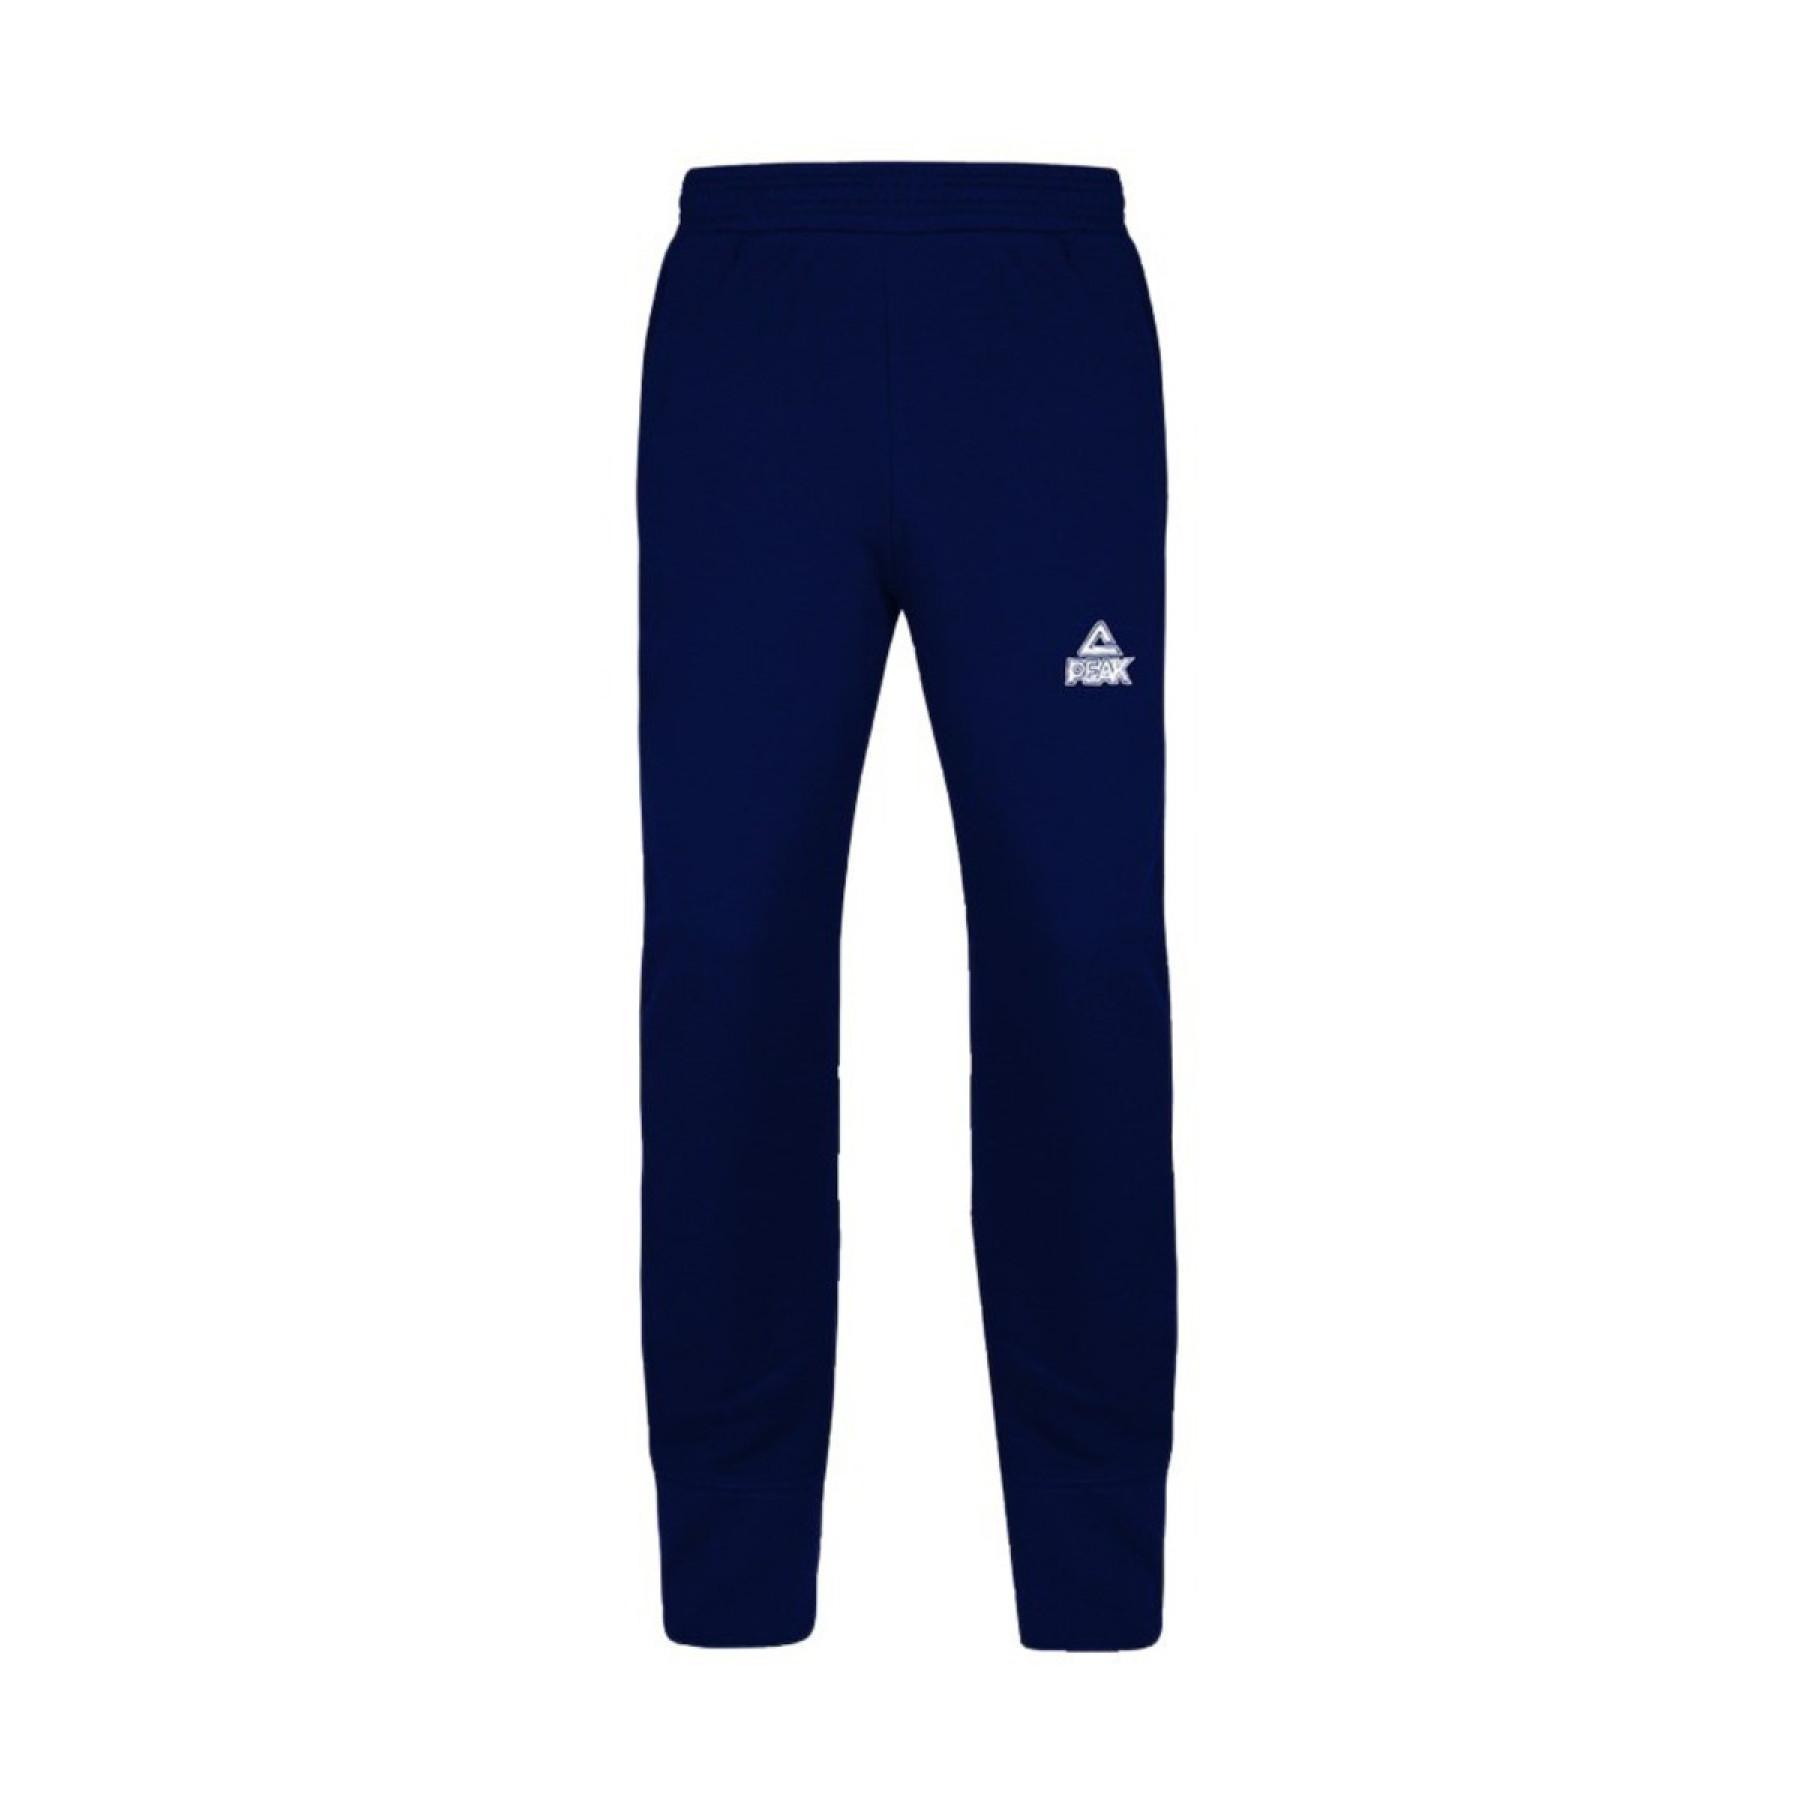 Pantalon enfant Peak élite